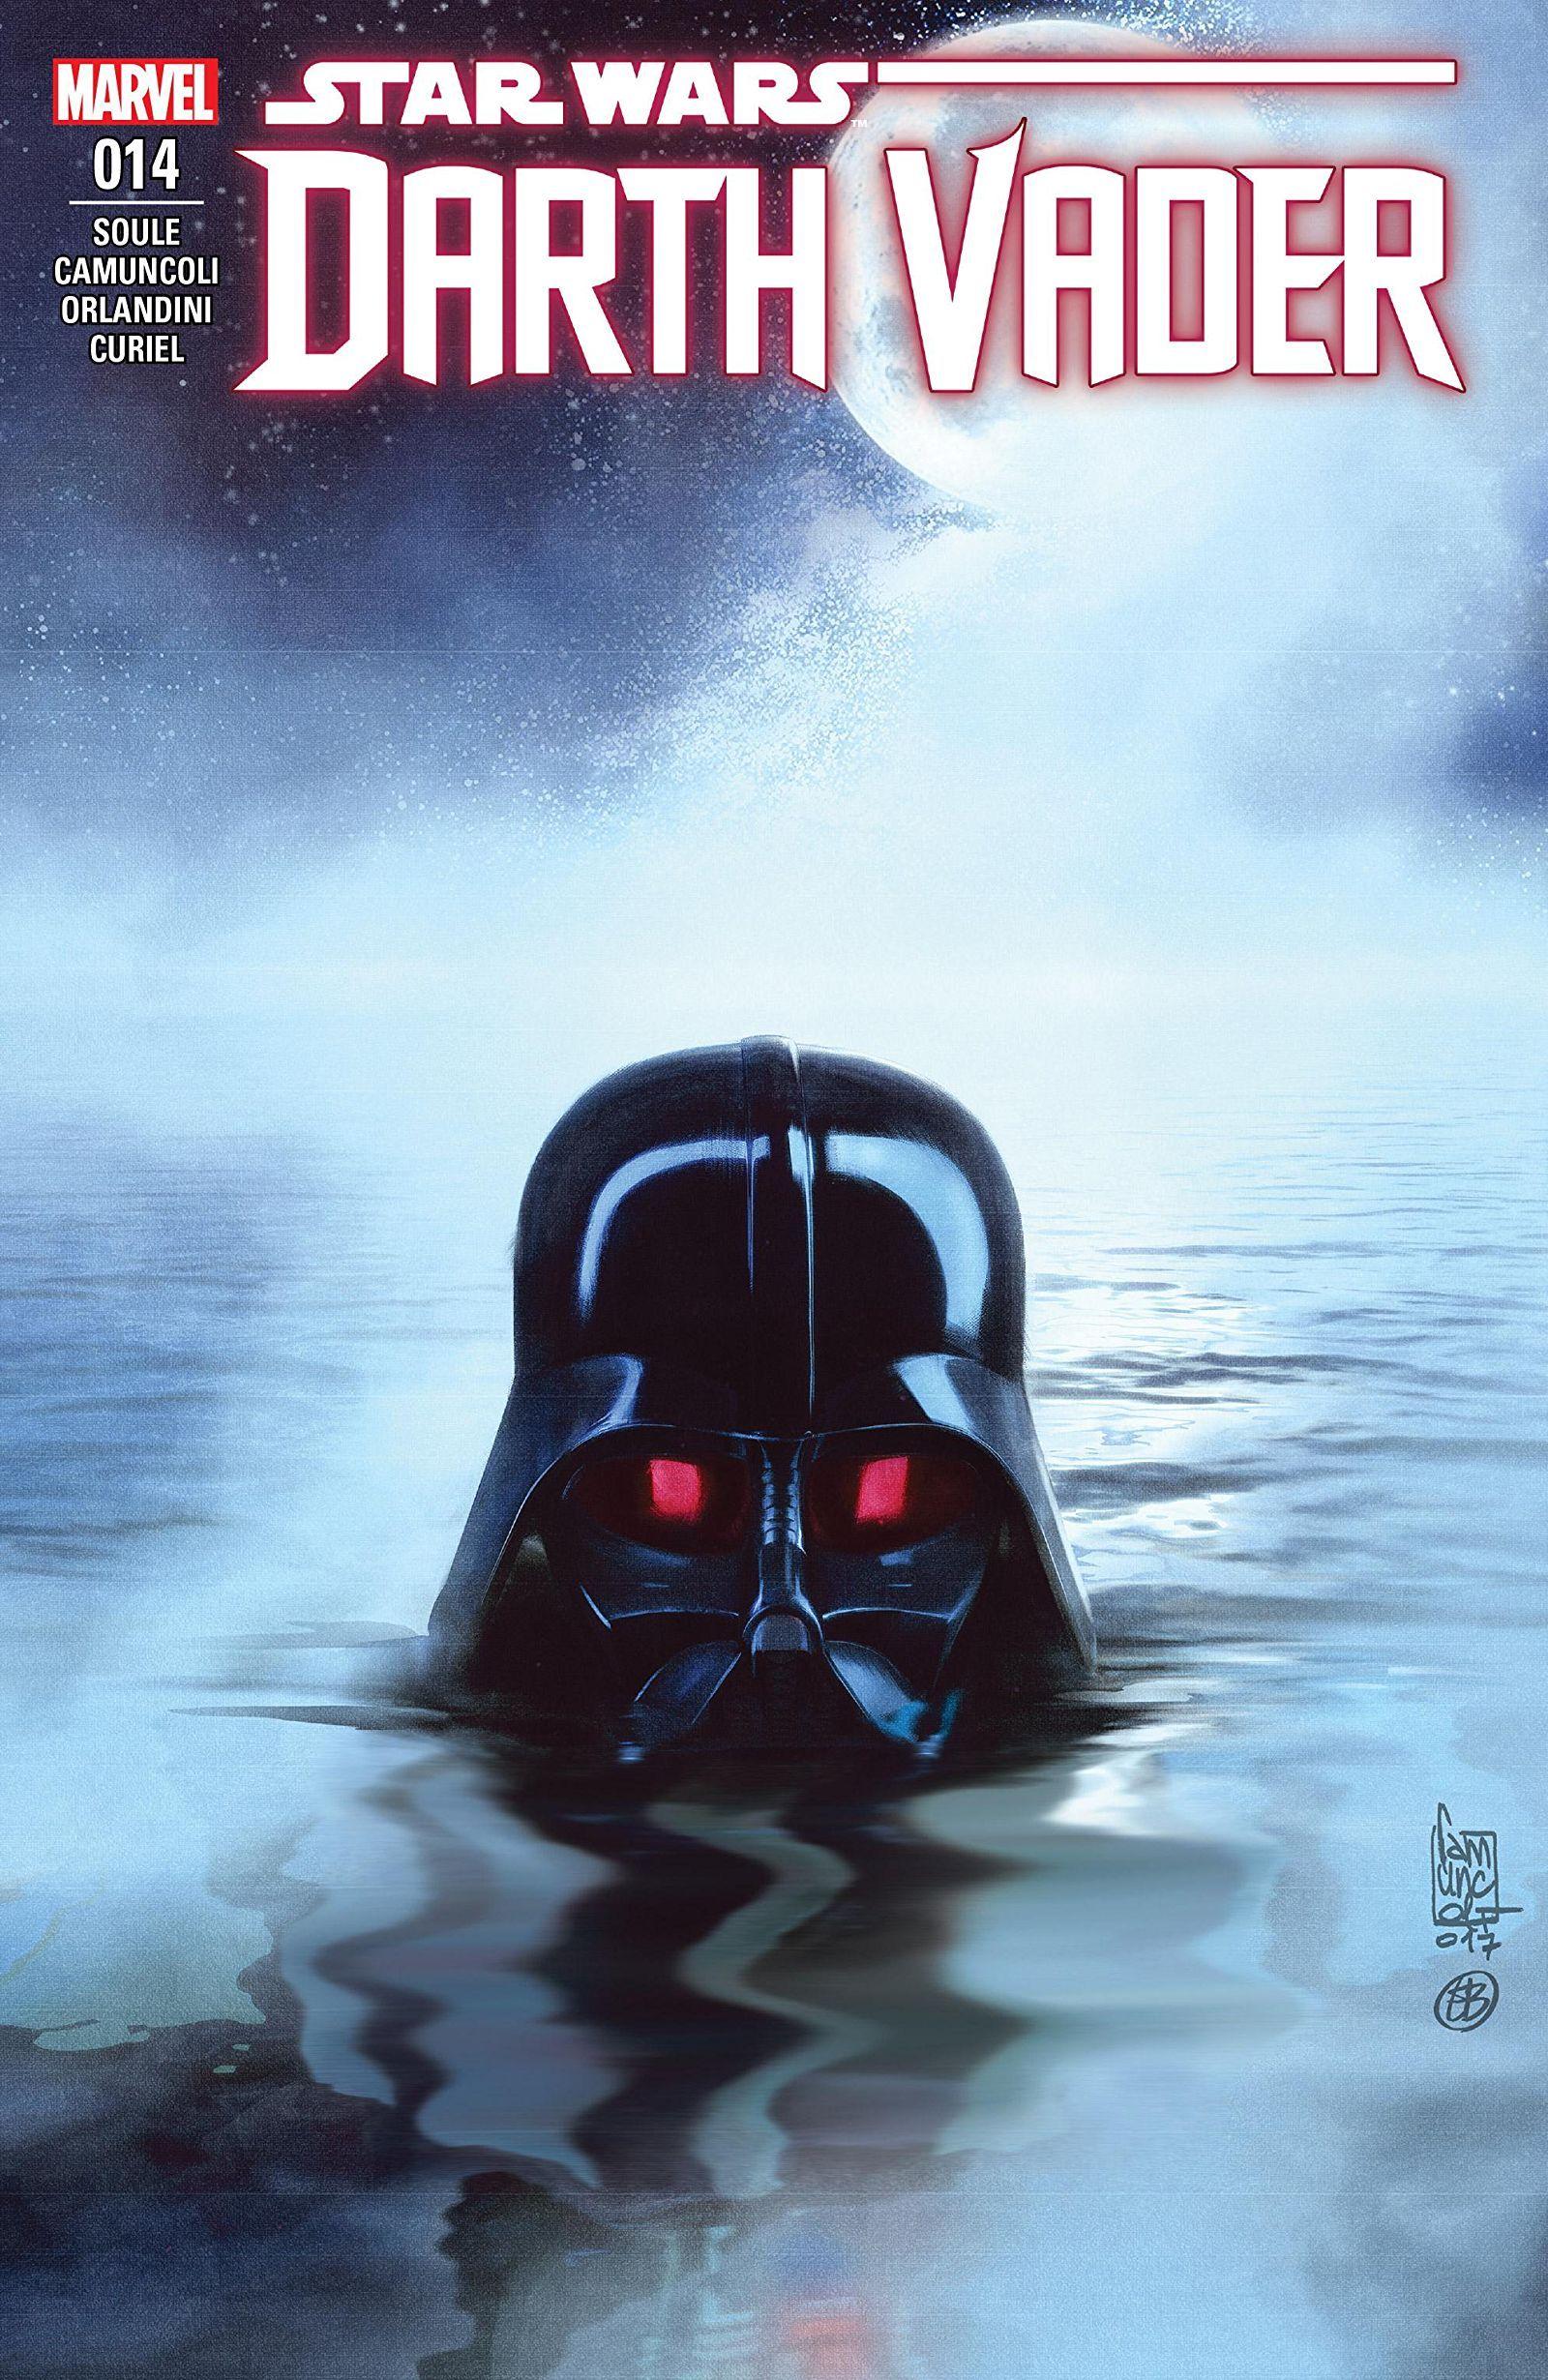 Darth Vader Dark Lord Of The Sith 14 Star Wars Comics Darth Vader Dark Lord Of The Sith